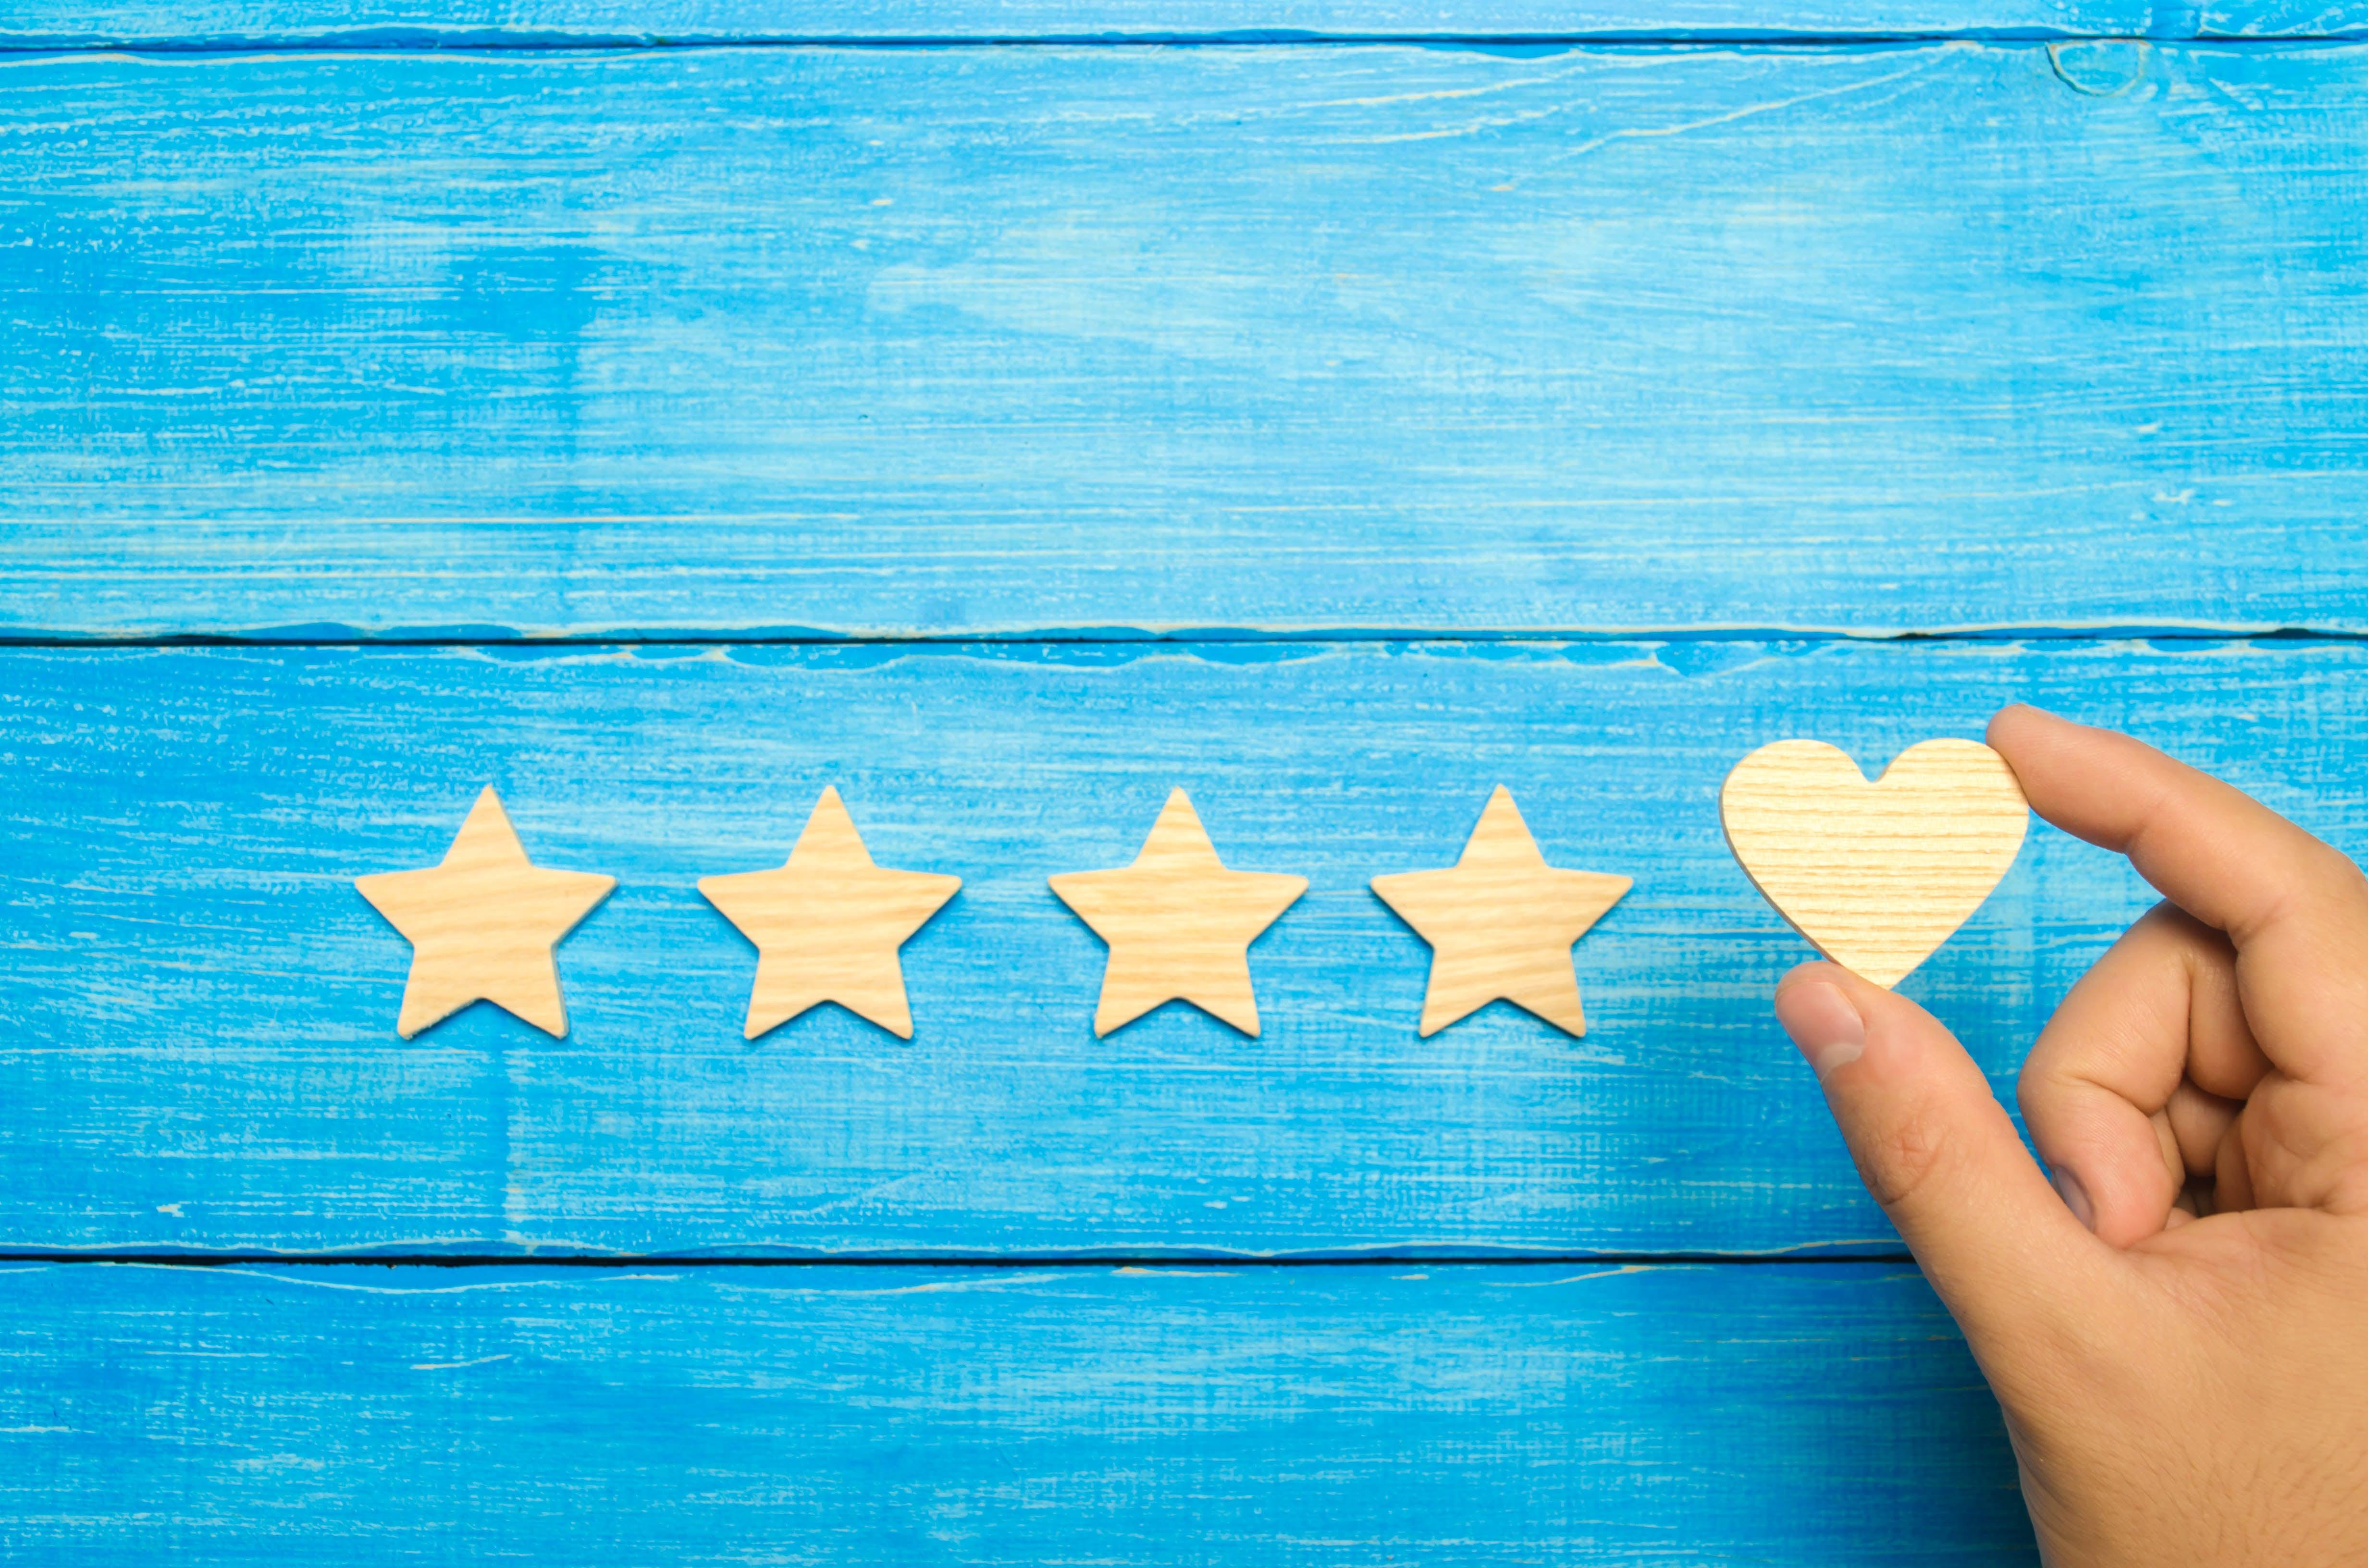 How Do You Establish Better B2B Customer Relationship Management? (Part 1 of 2)